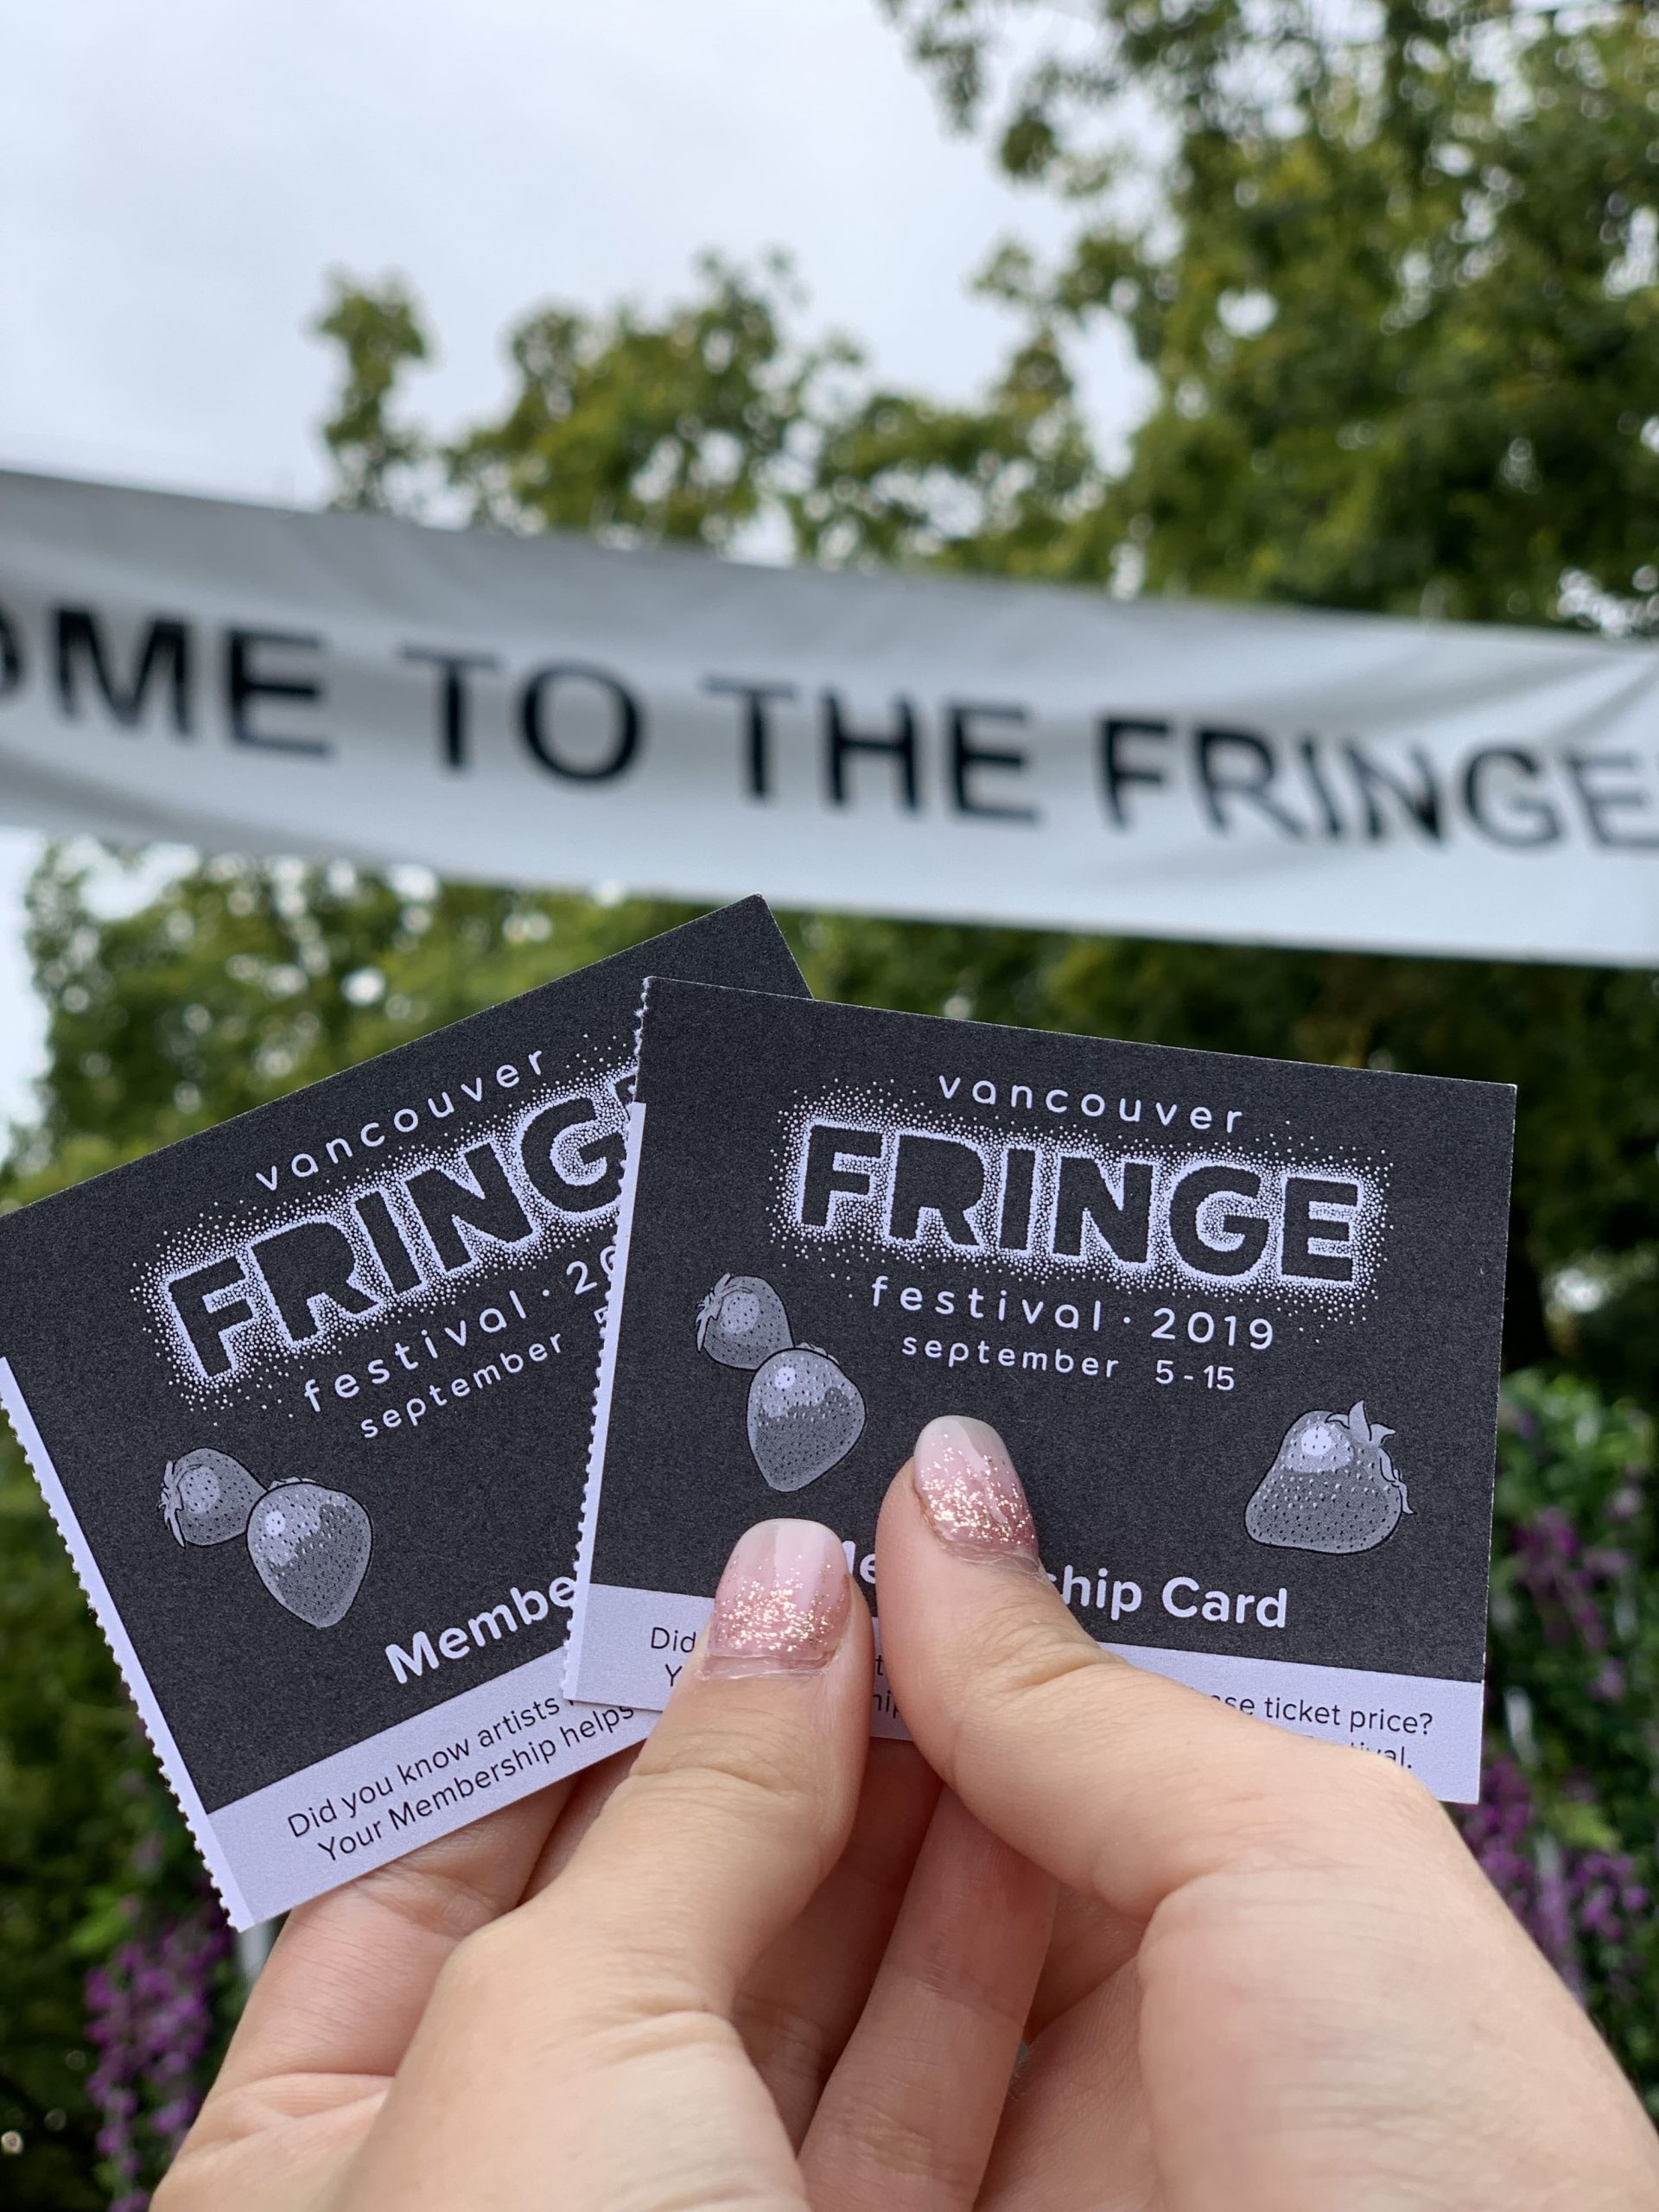 Ticket stubs to Vancouver Fringe Festival on Granville Island